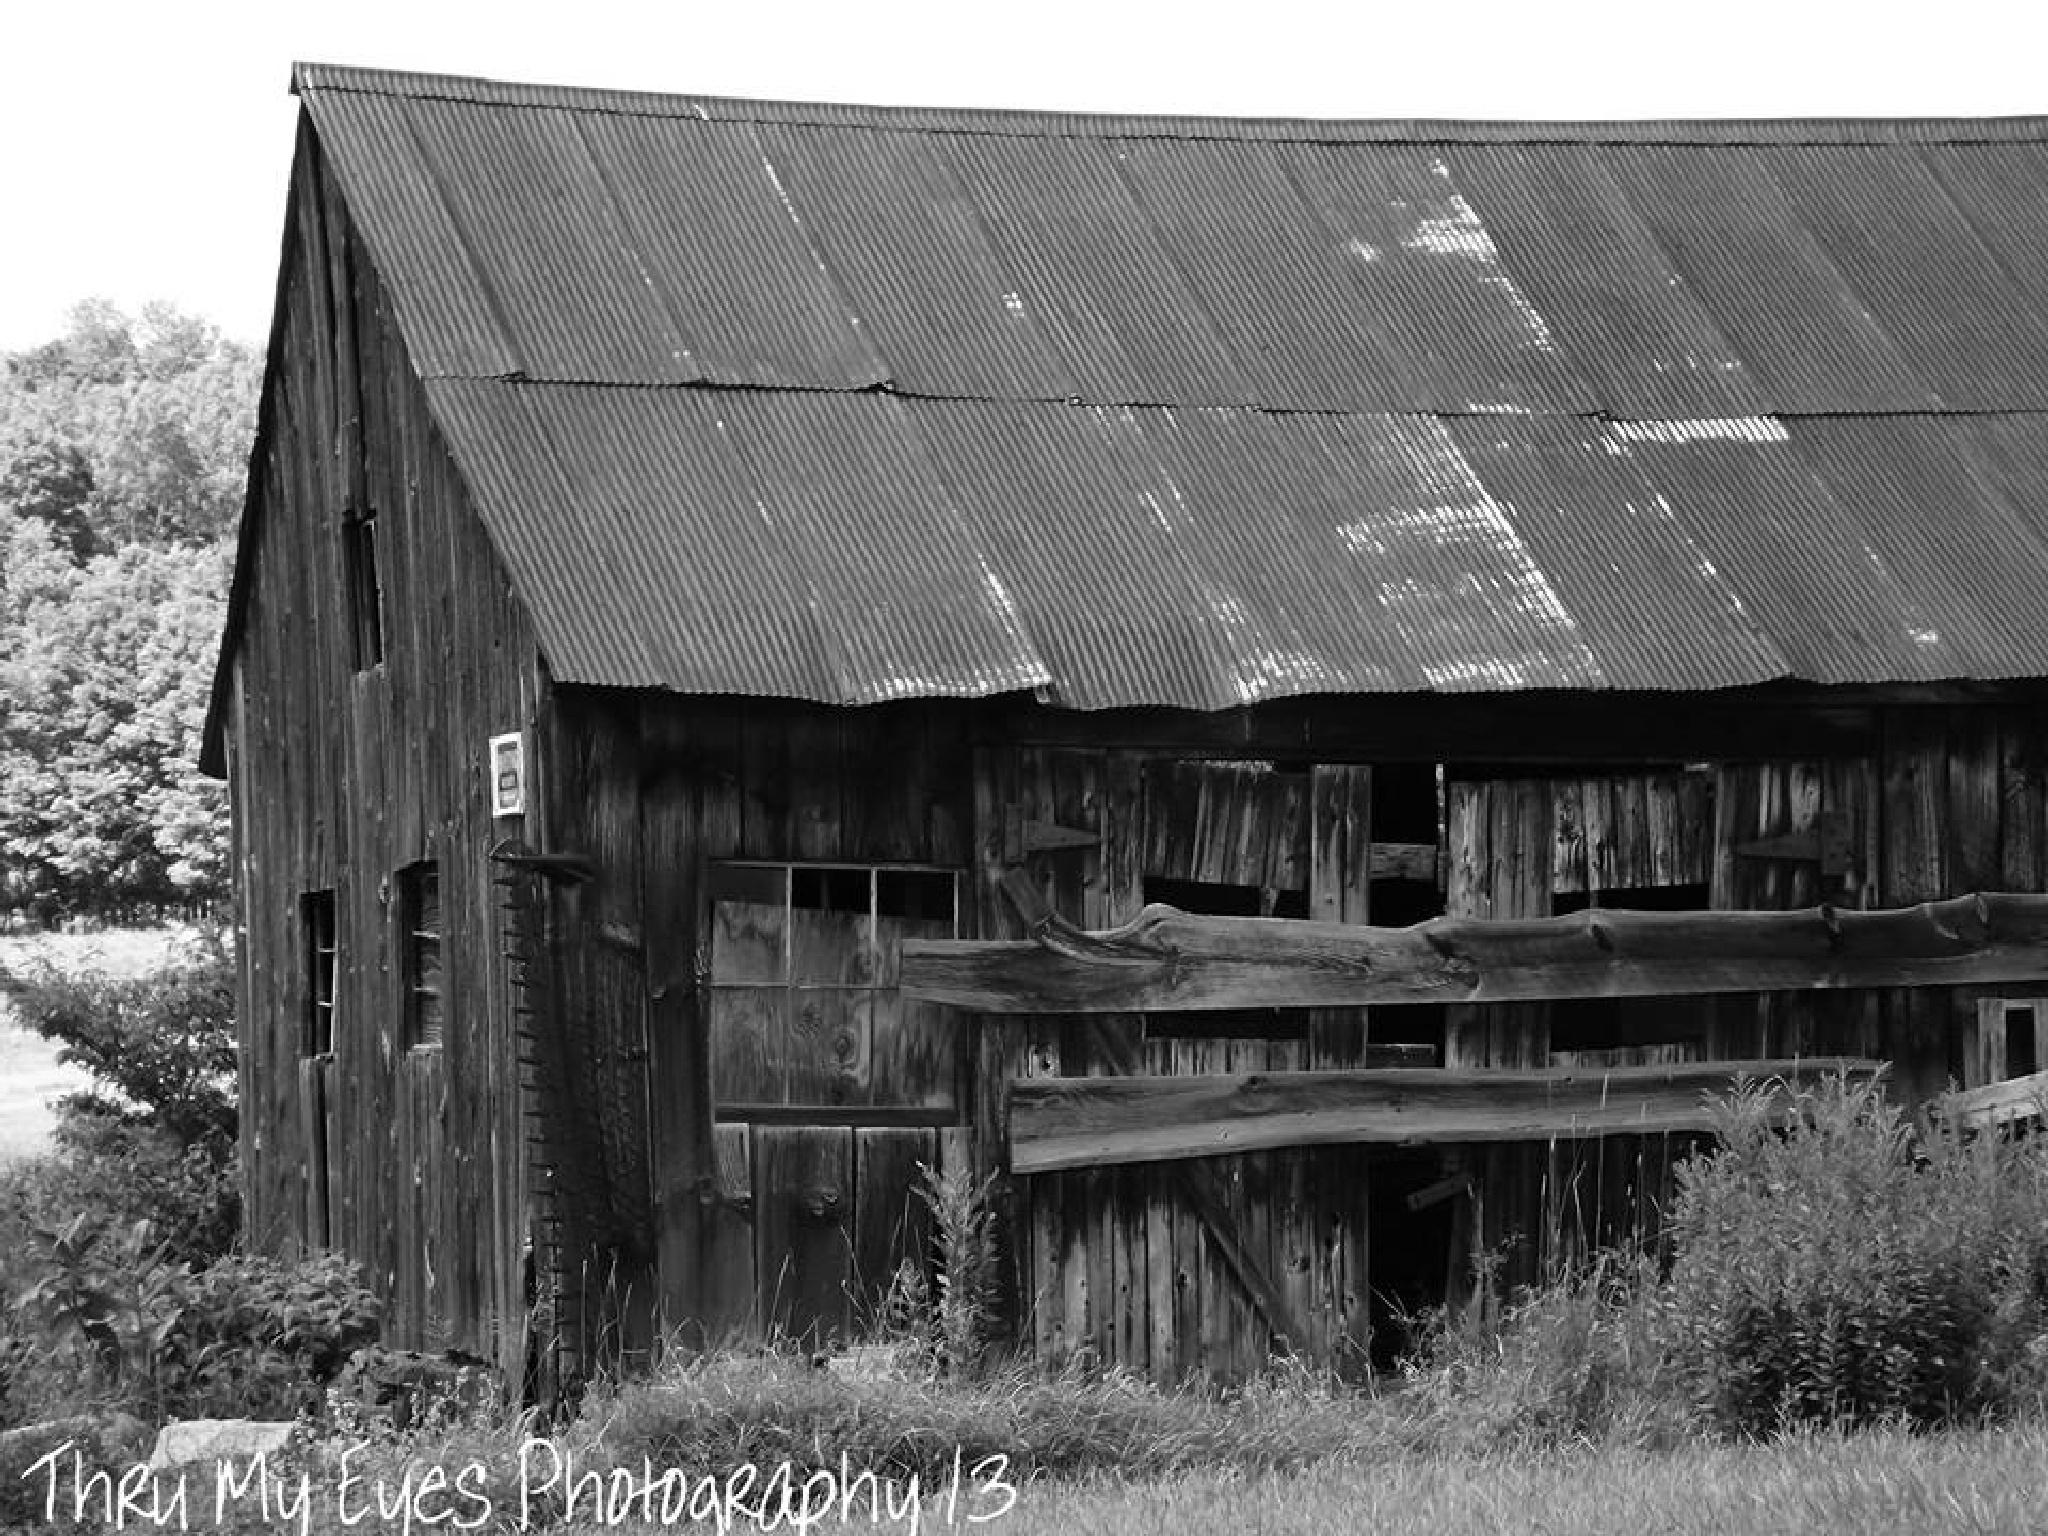 Early 19 Hundreds Barn by captain